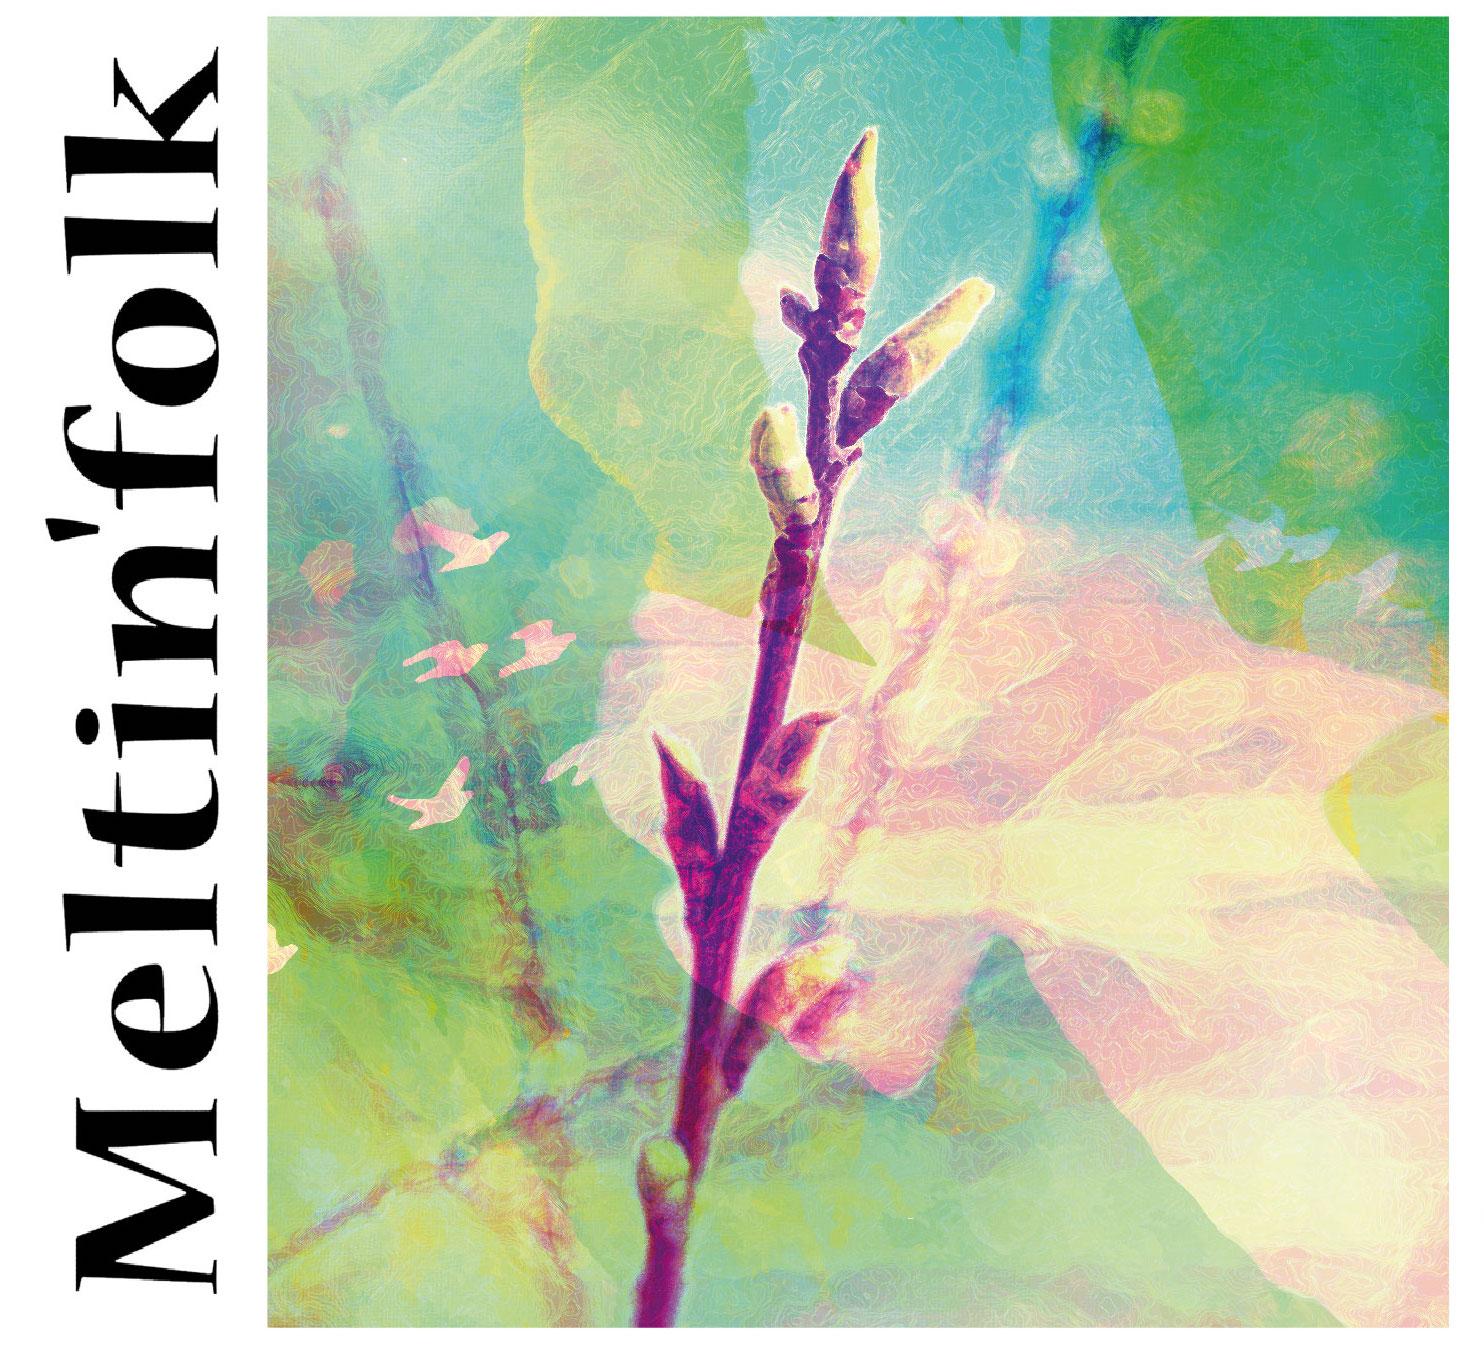 11/13 aprile – Meltin'folk, XIII edizione a Pasqua